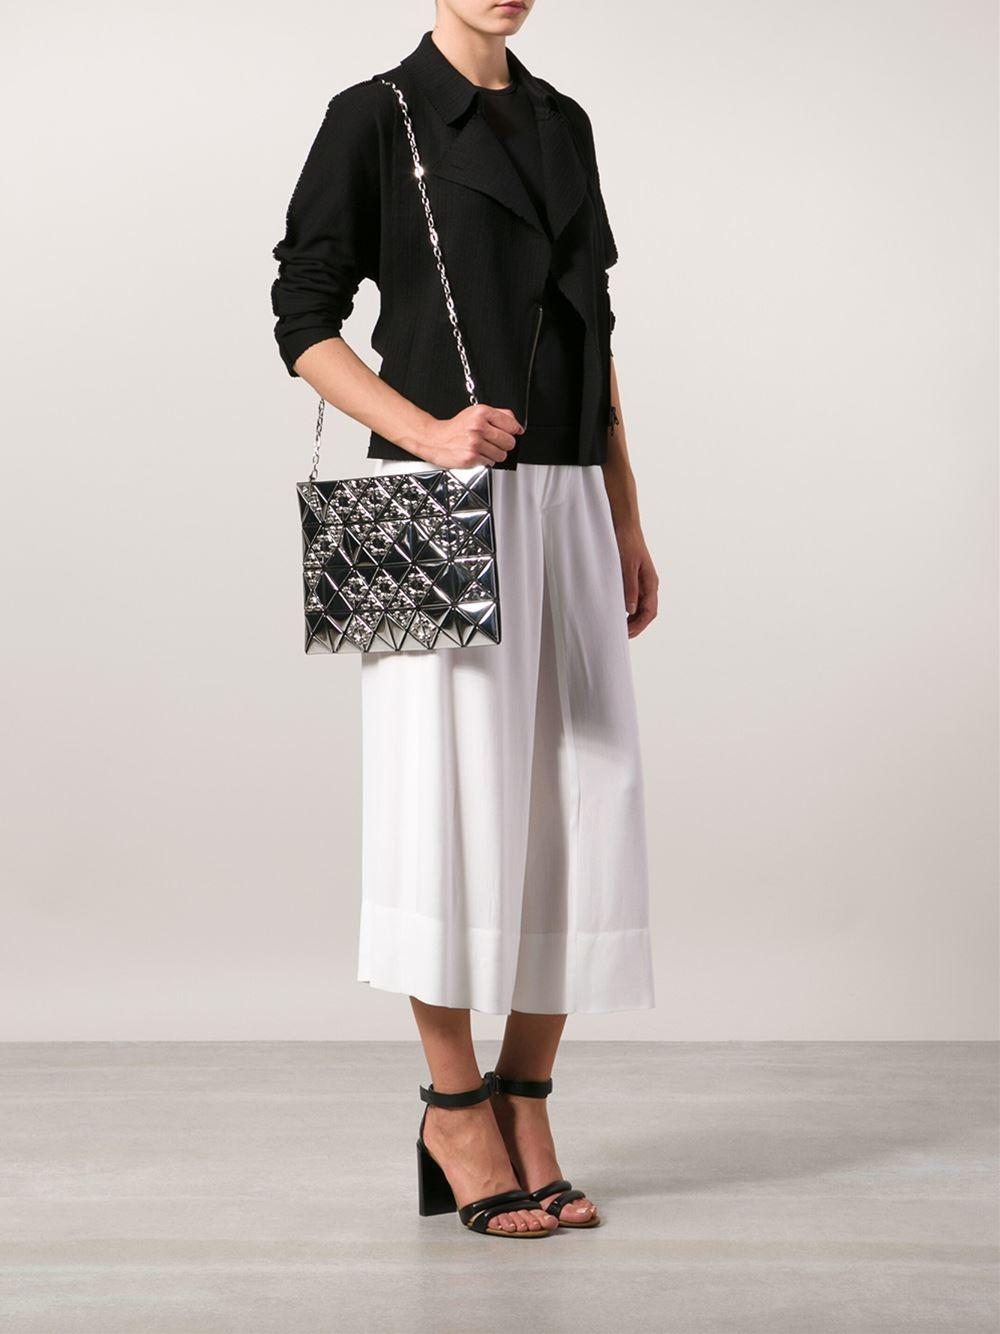 Lyst Bao Bao Issey Miyake Prism Shoulder Bag In Metallic